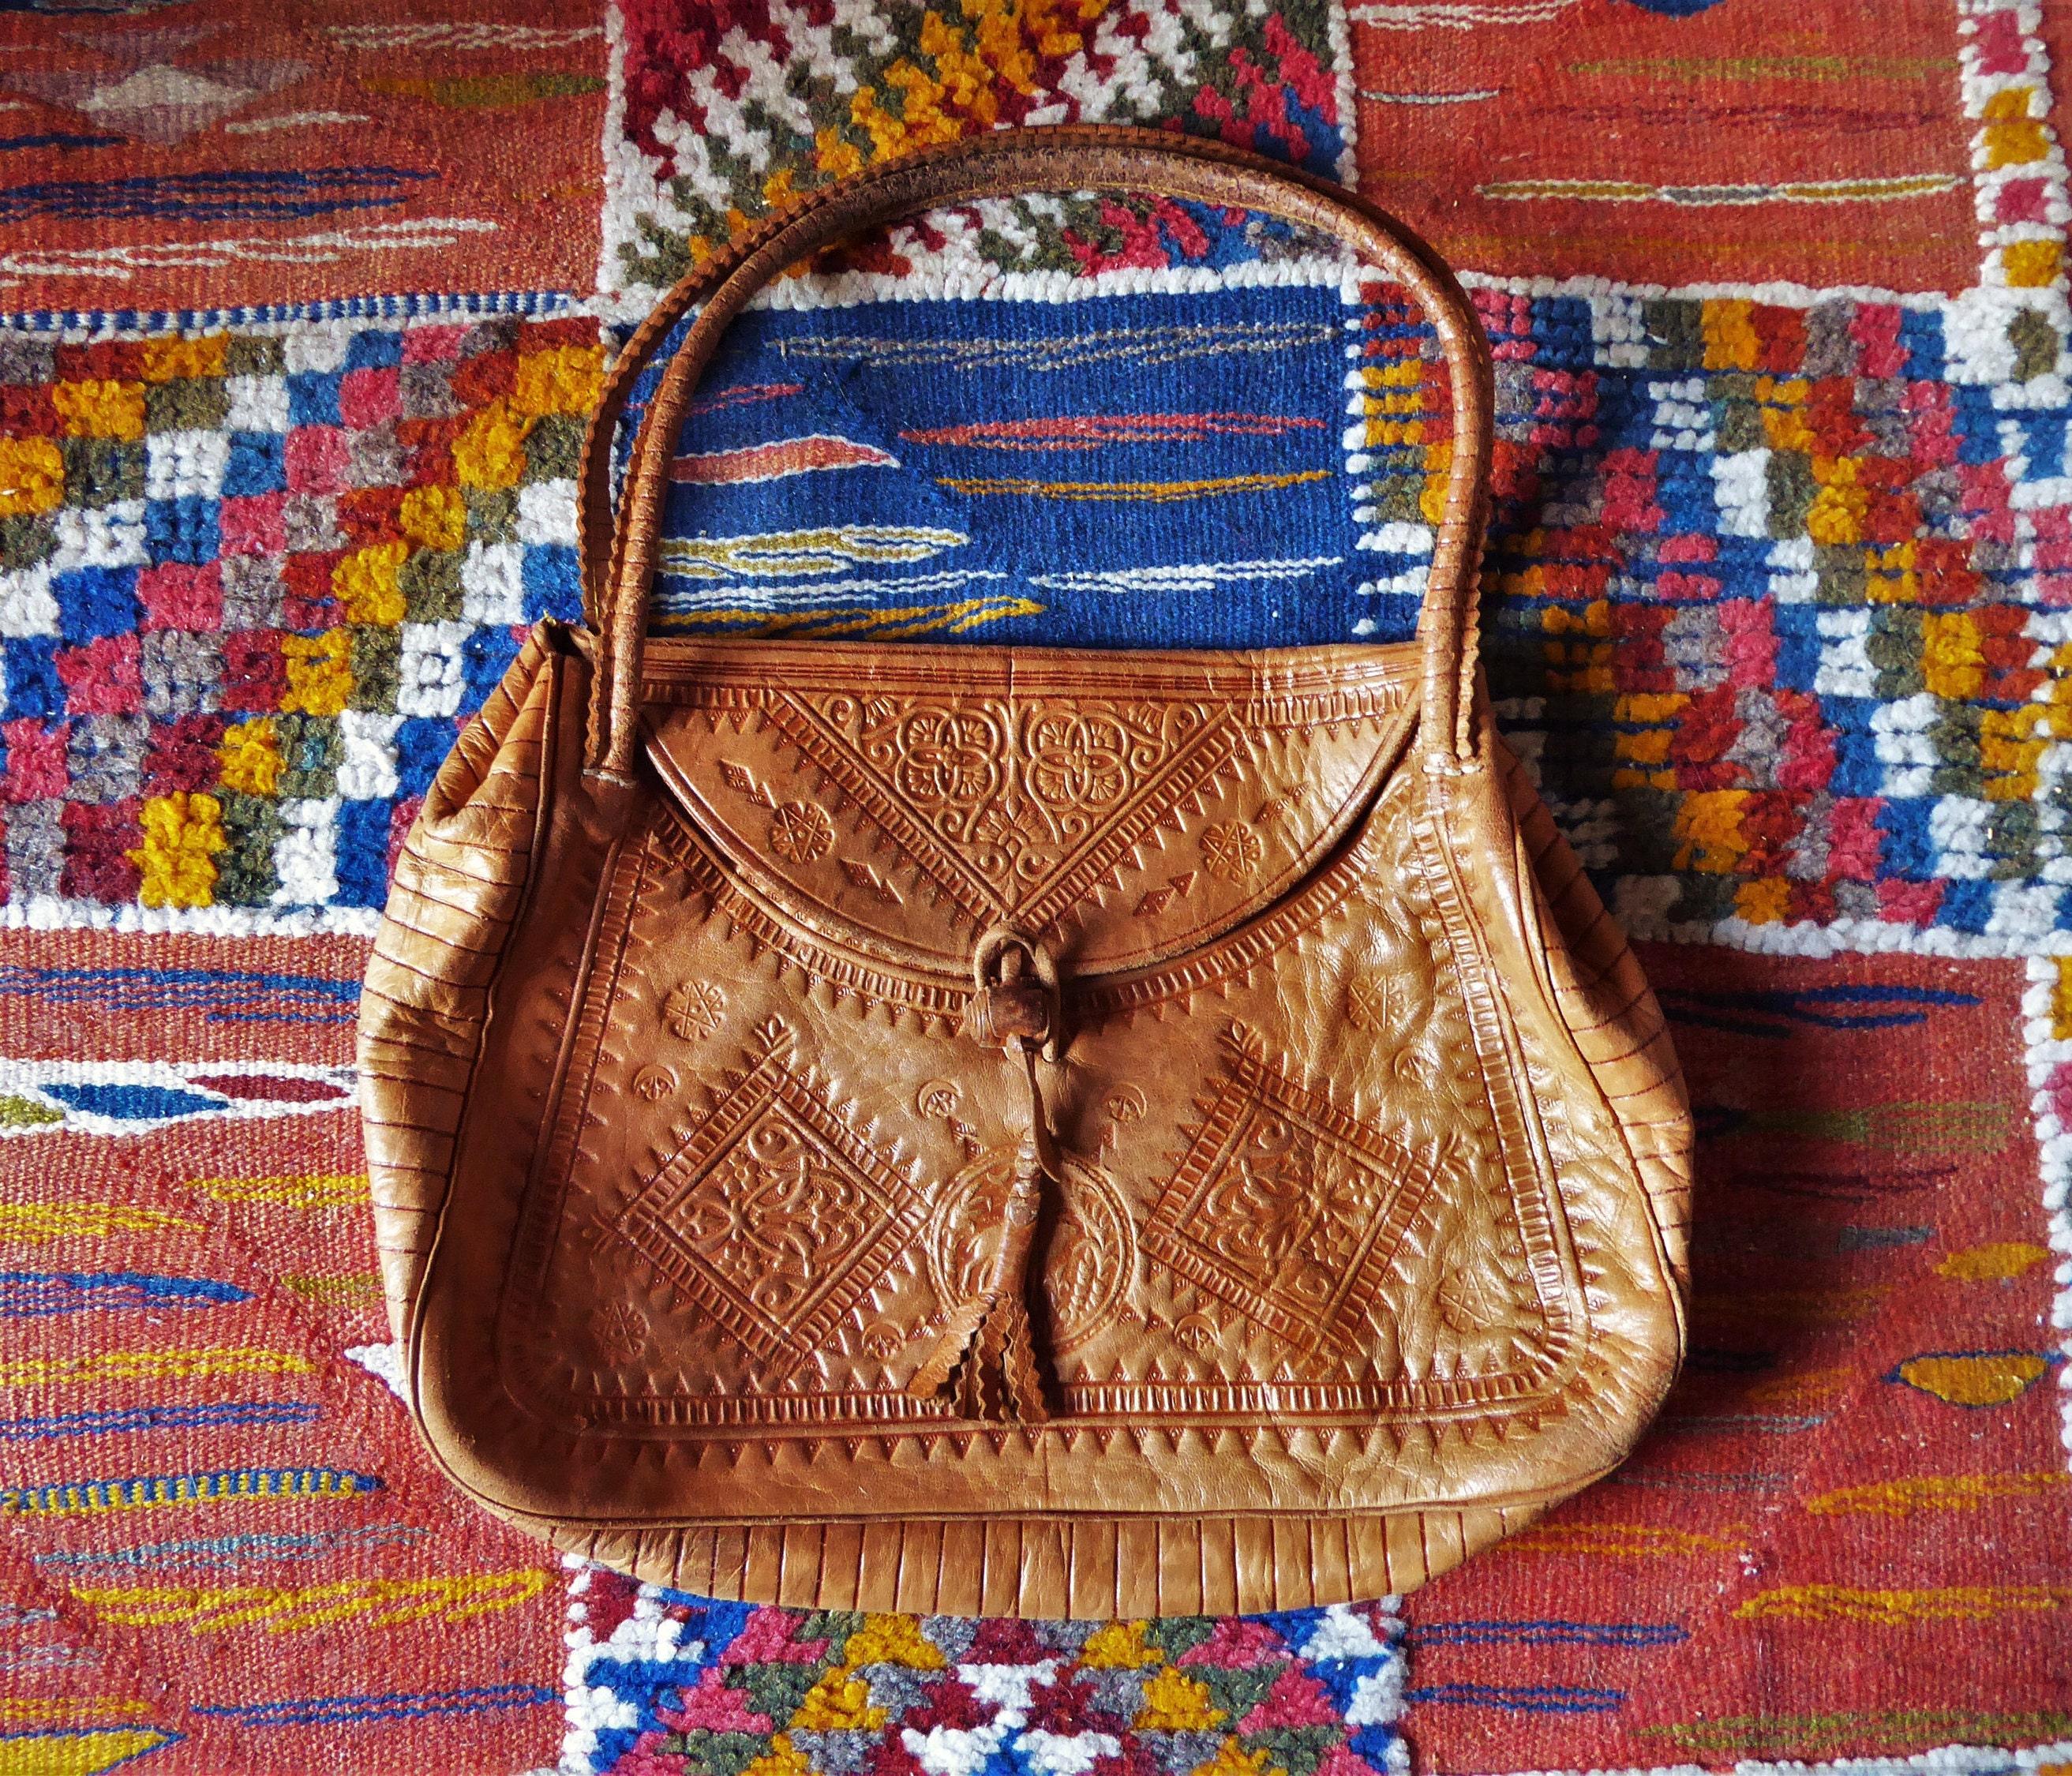 Moroccan leather handbag soft leather bag tan embossed leather boho bohemian